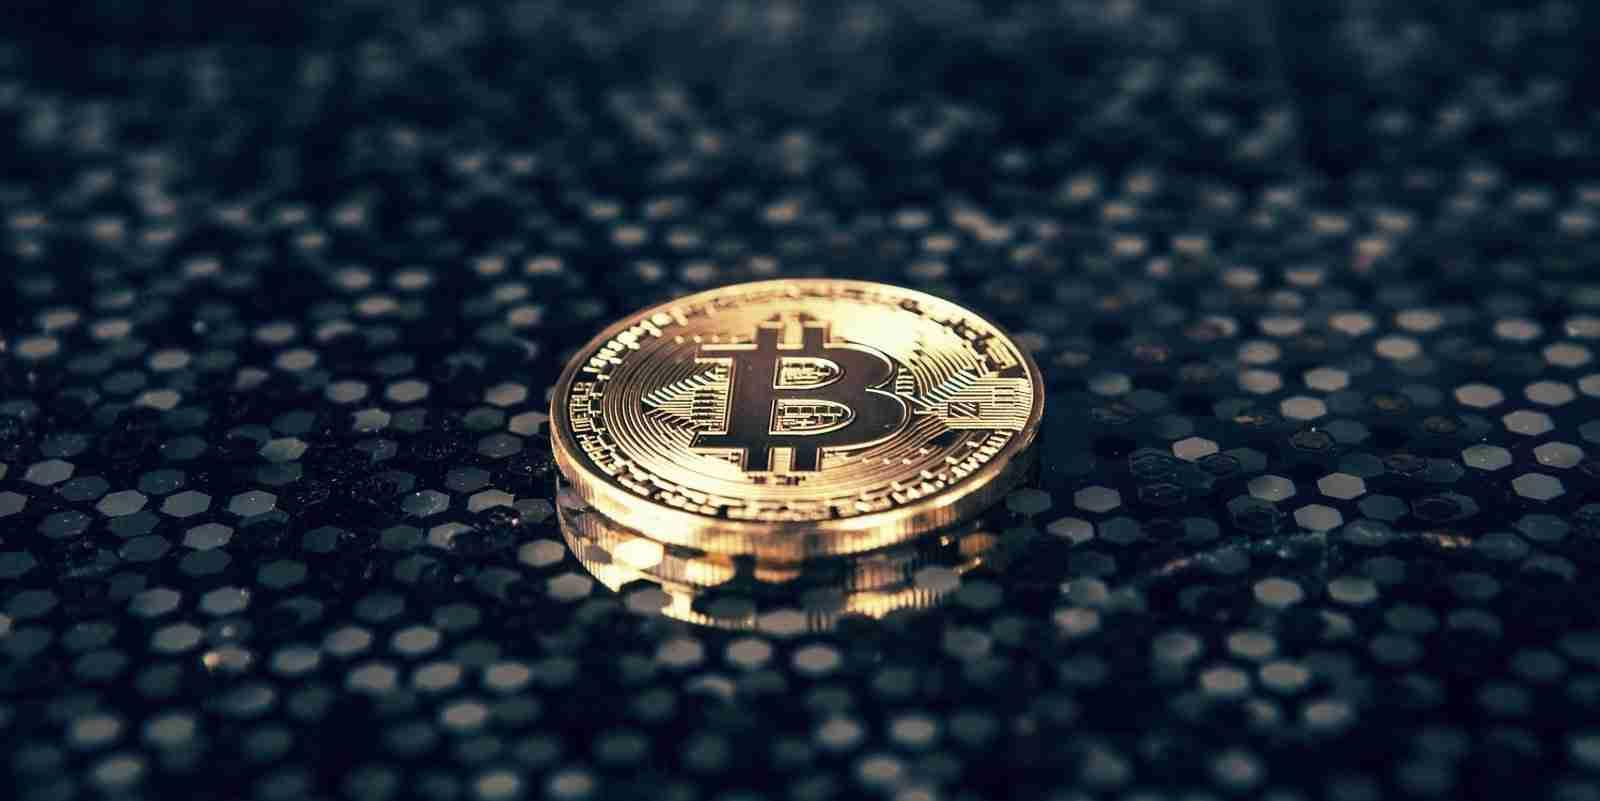 HackBoss Malware Poses As Hacker Tools On Telegram To Steal Digital Coins